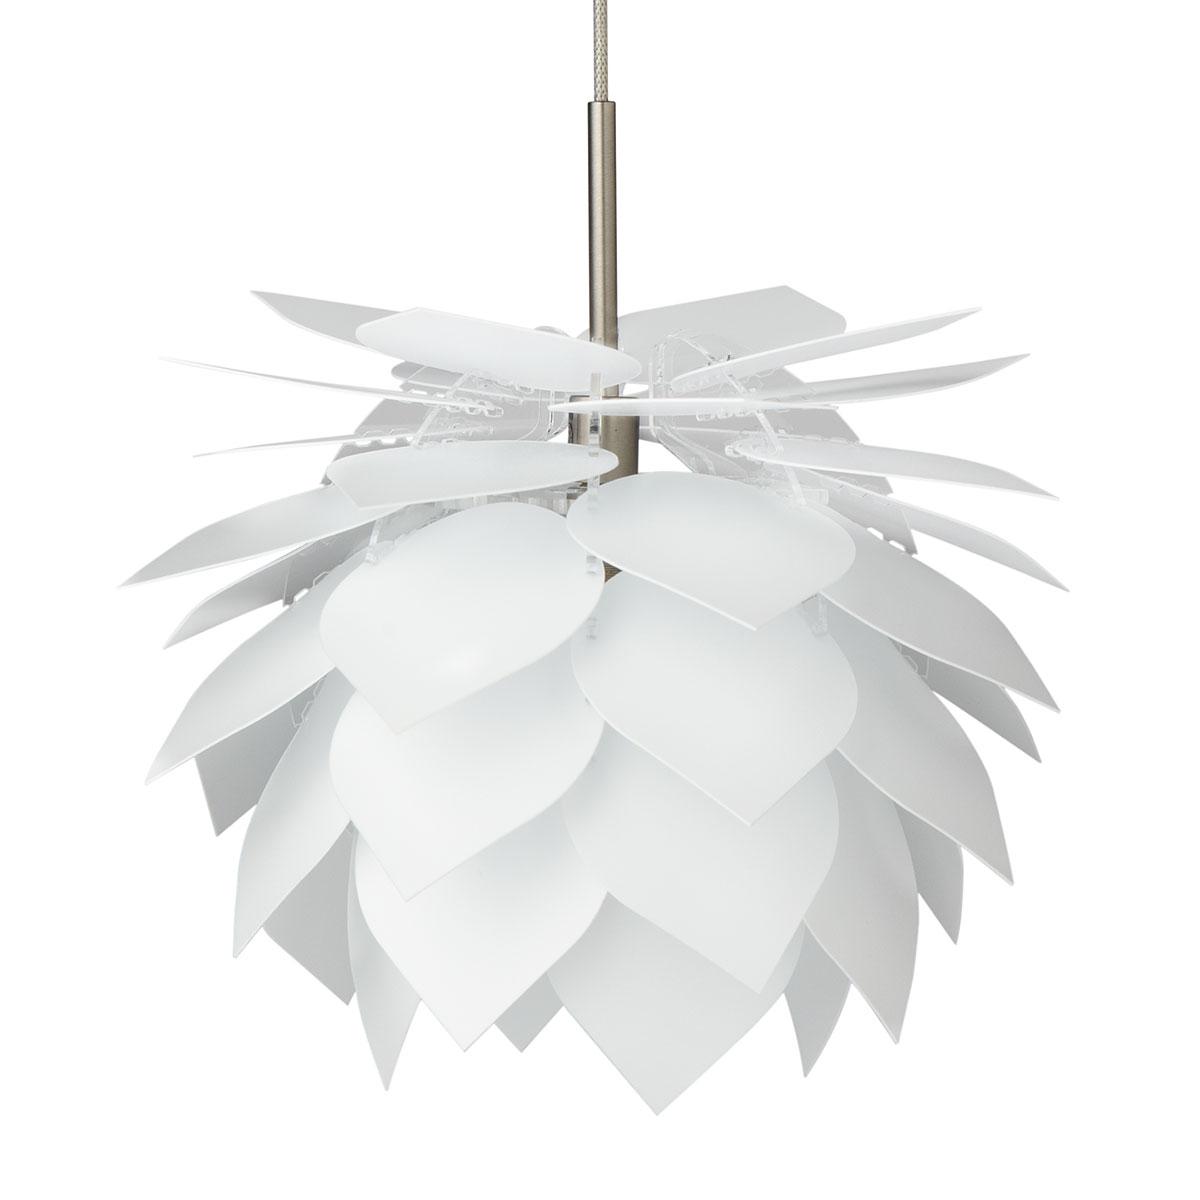 Billede af DybergLarsen pendel - PineApple DripDrop XS G9 - Hvid